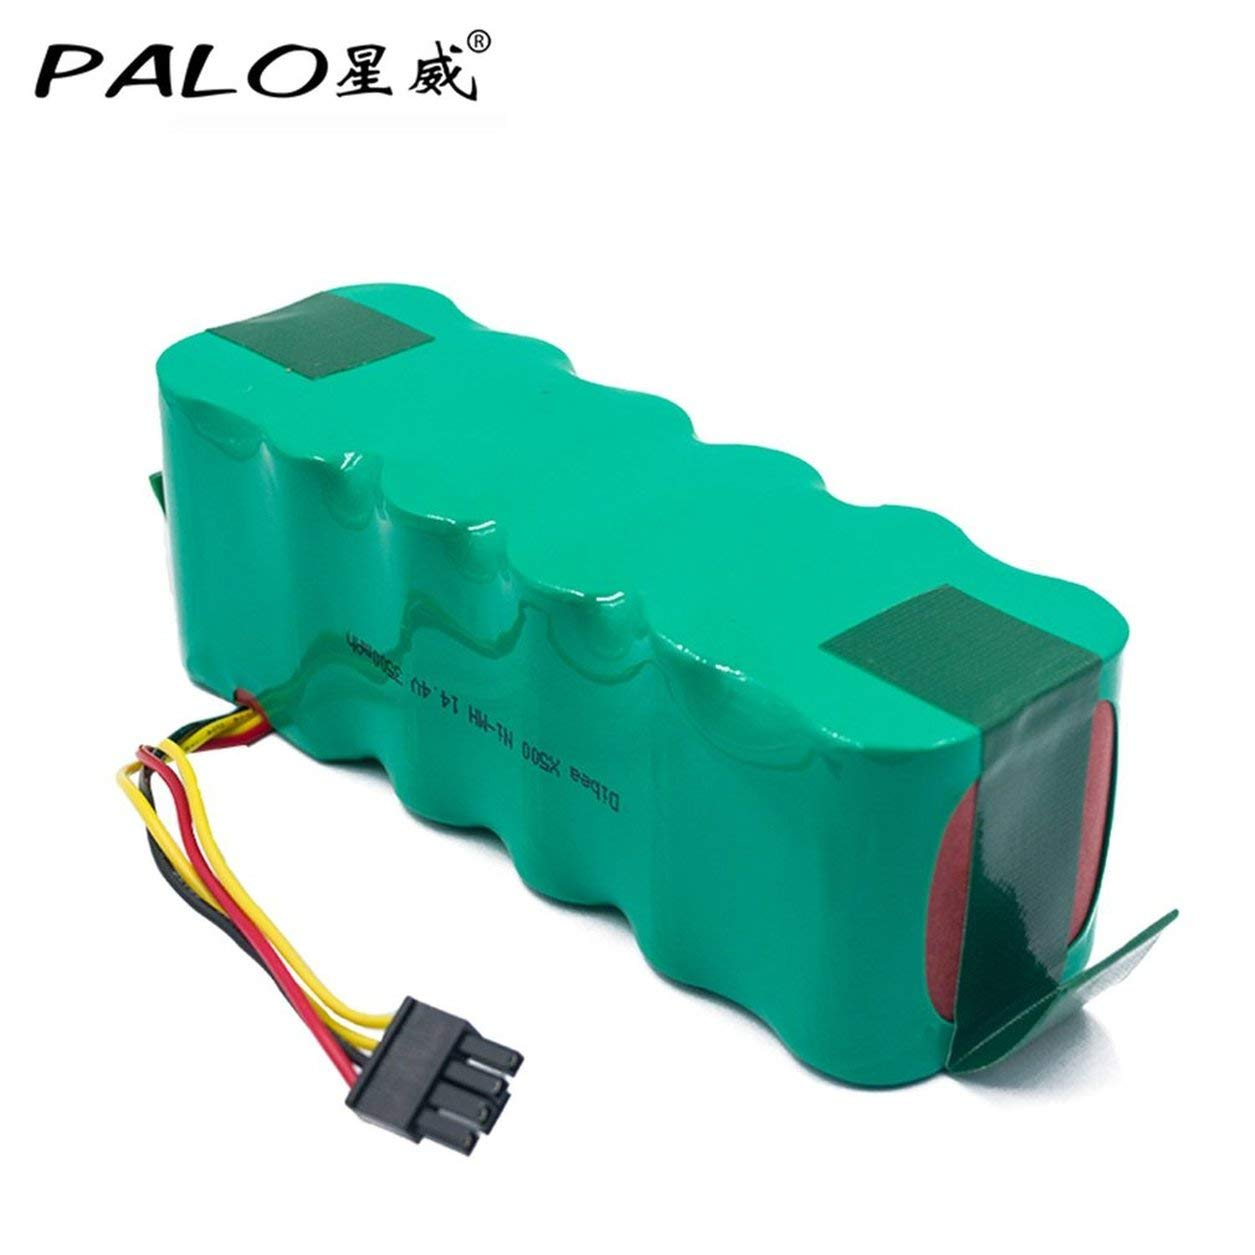 PALO High Grade Battery Core 3500MAH 14.4V NI-MH Sweeper Rechargeable Battery Dailyinshop